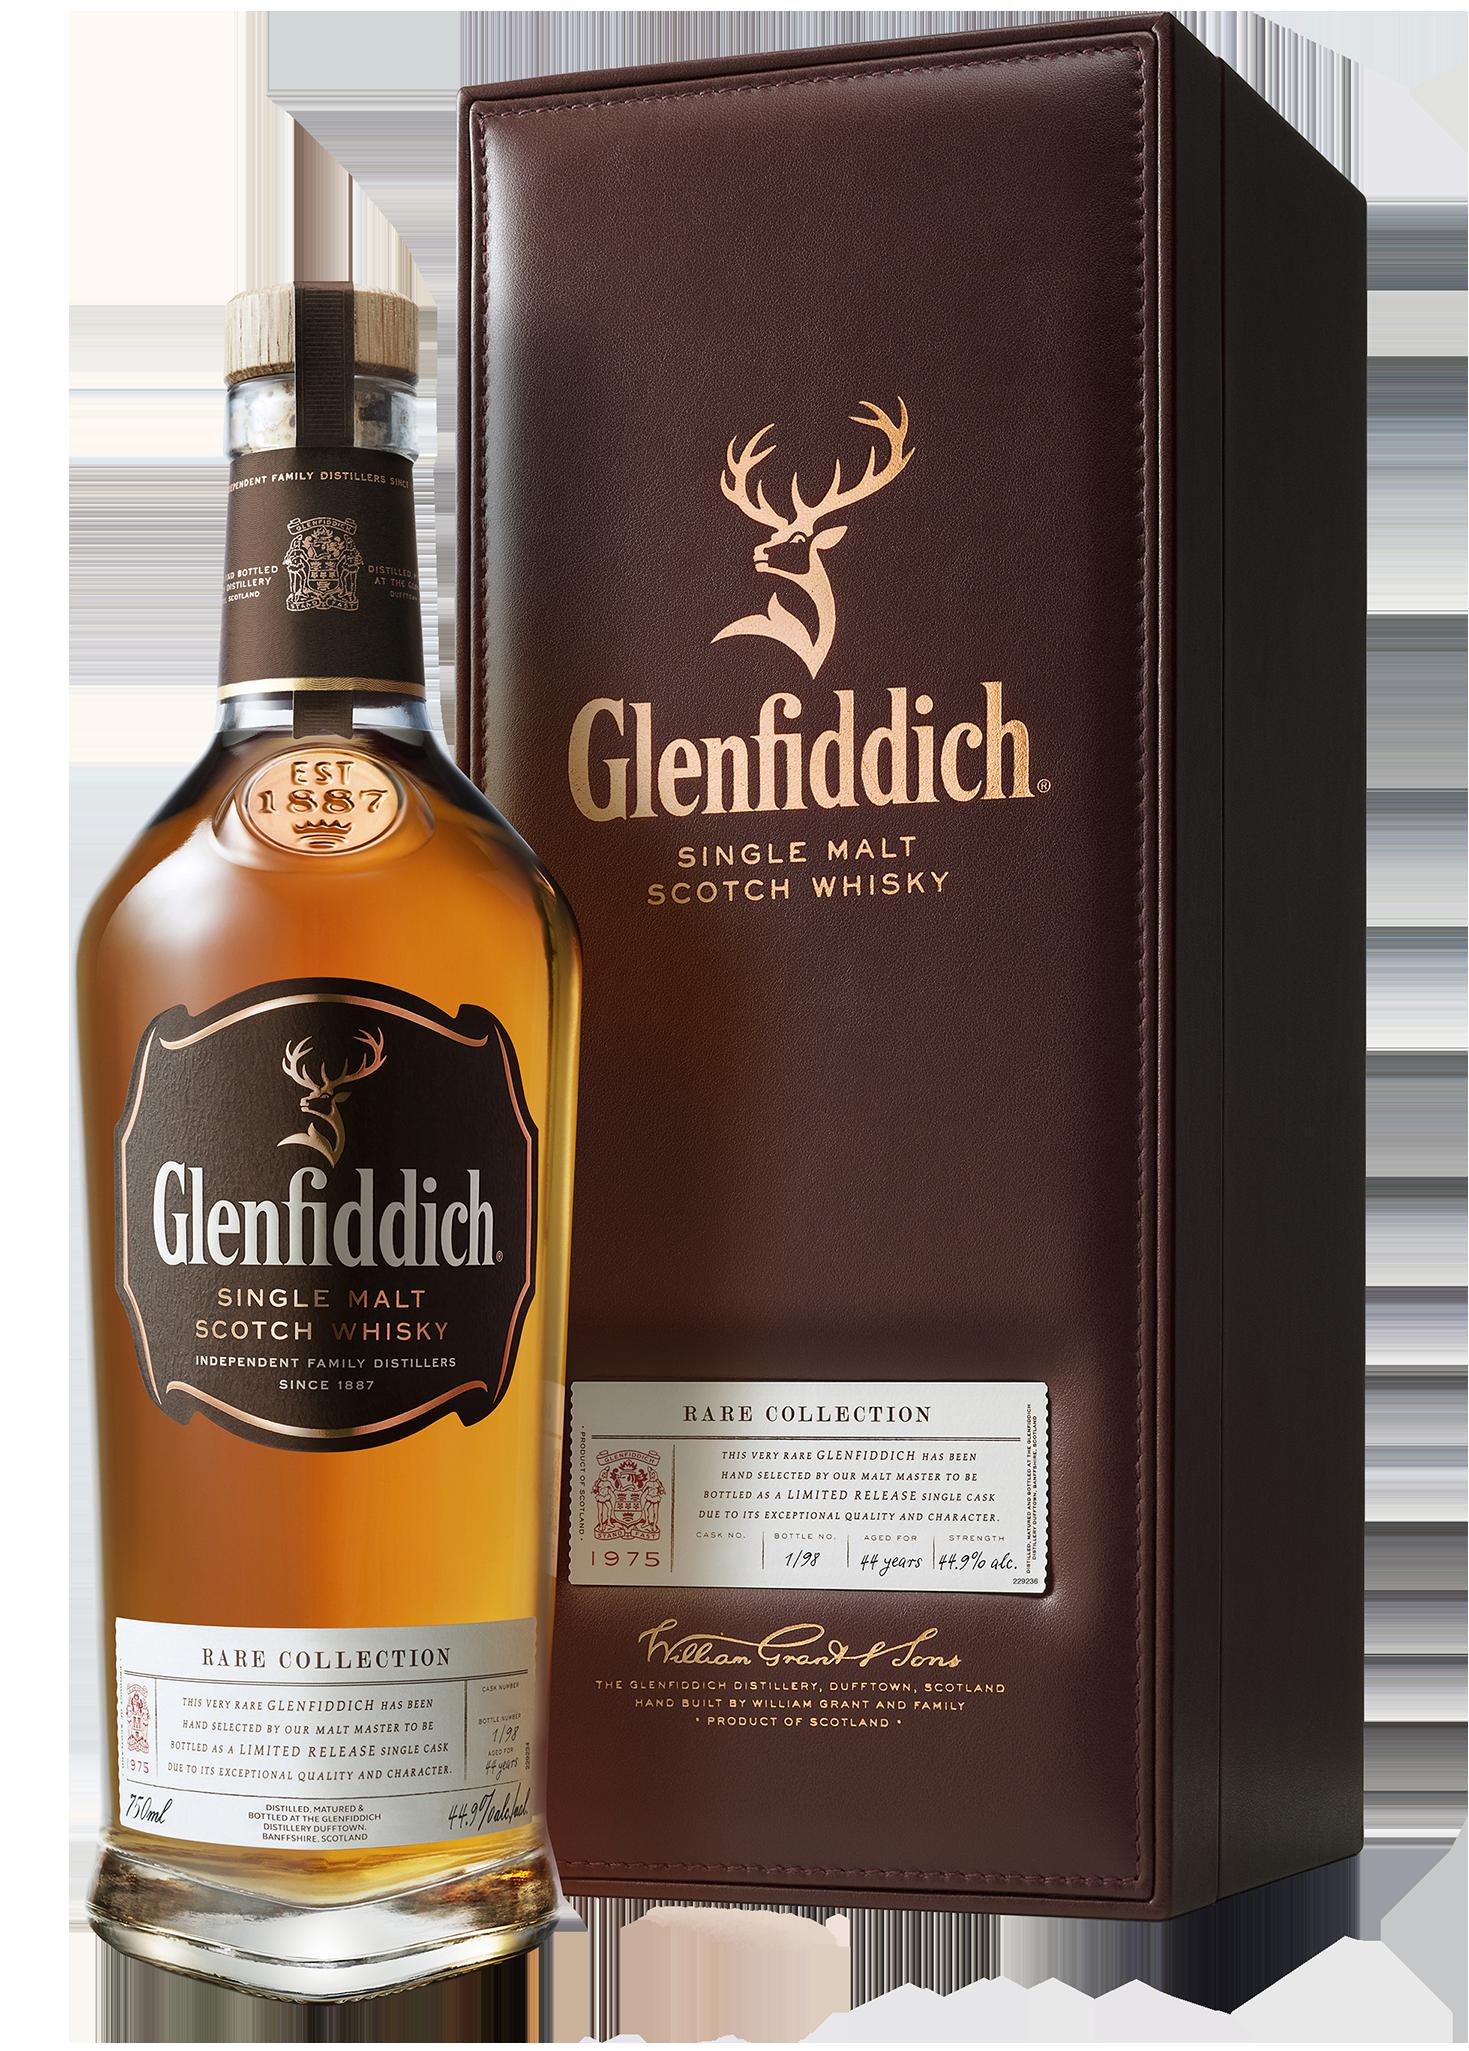 The Glenfiddich Rare Collection Unveils Two New Vintage Casks